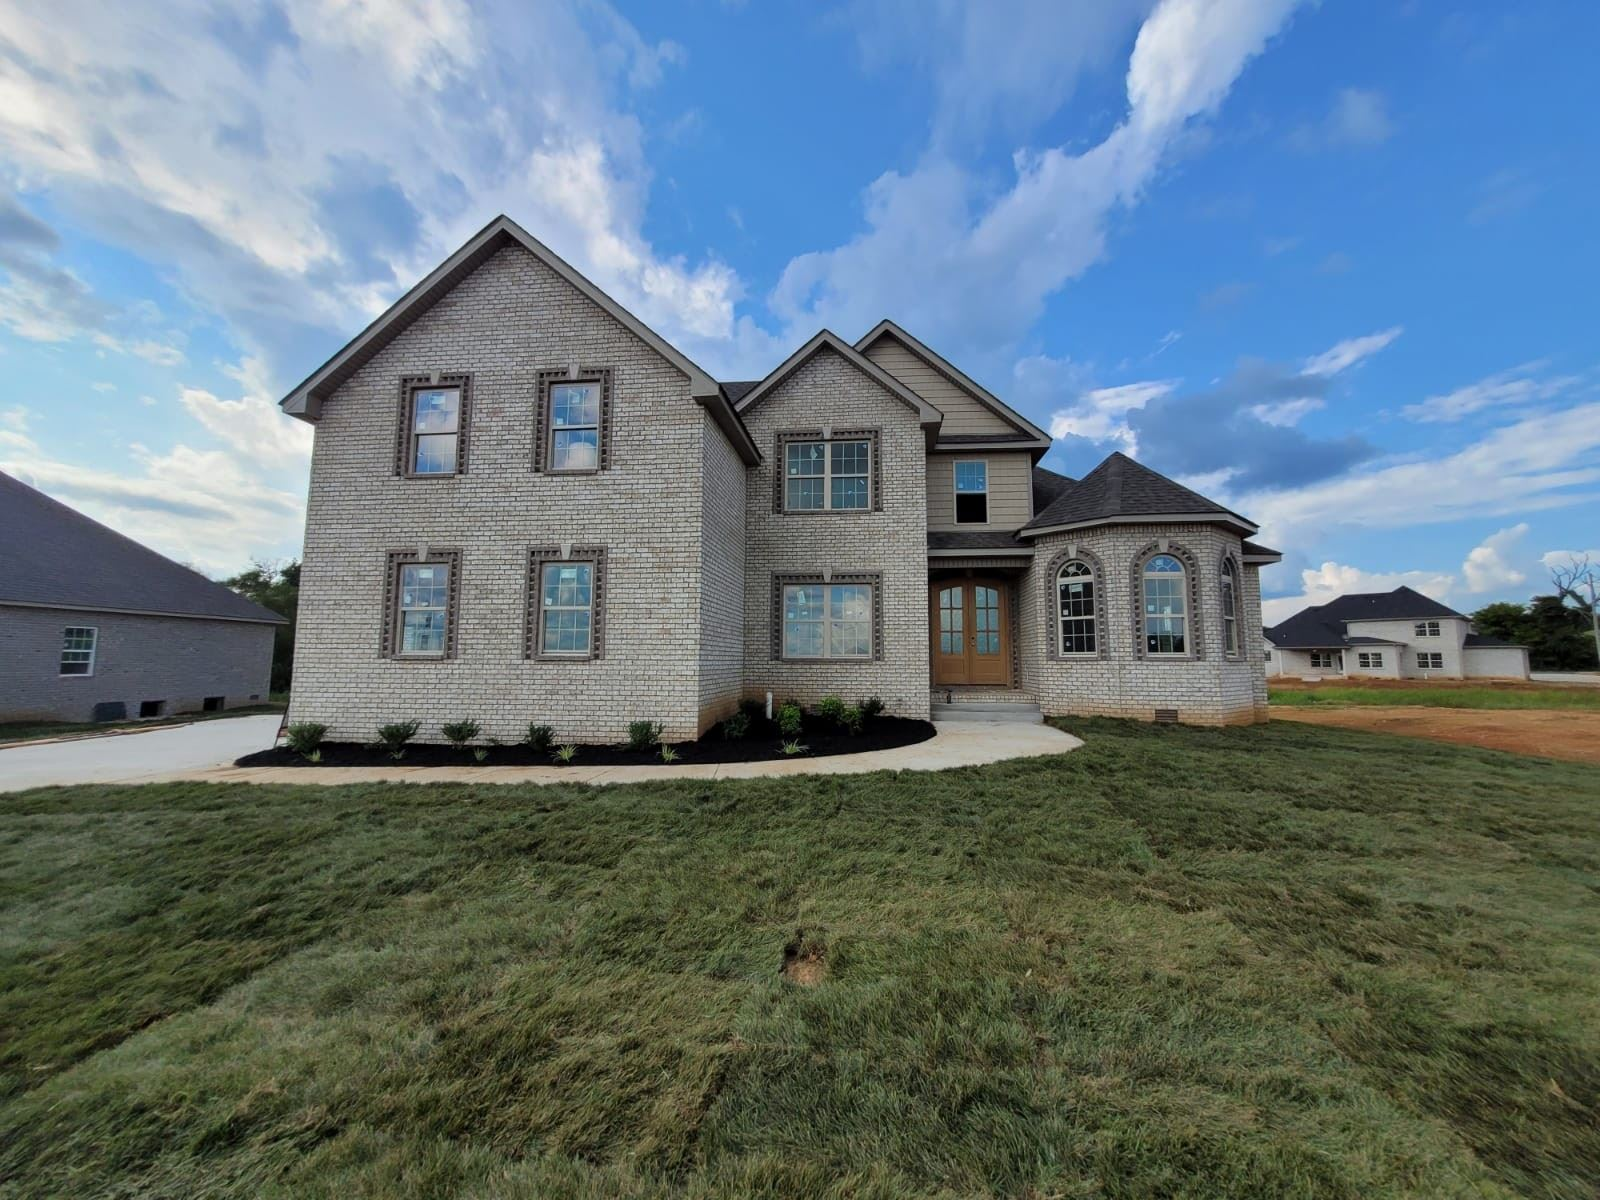 126 Hartley Hills, Clarksville, TN 37043 - MLS#: 2227422